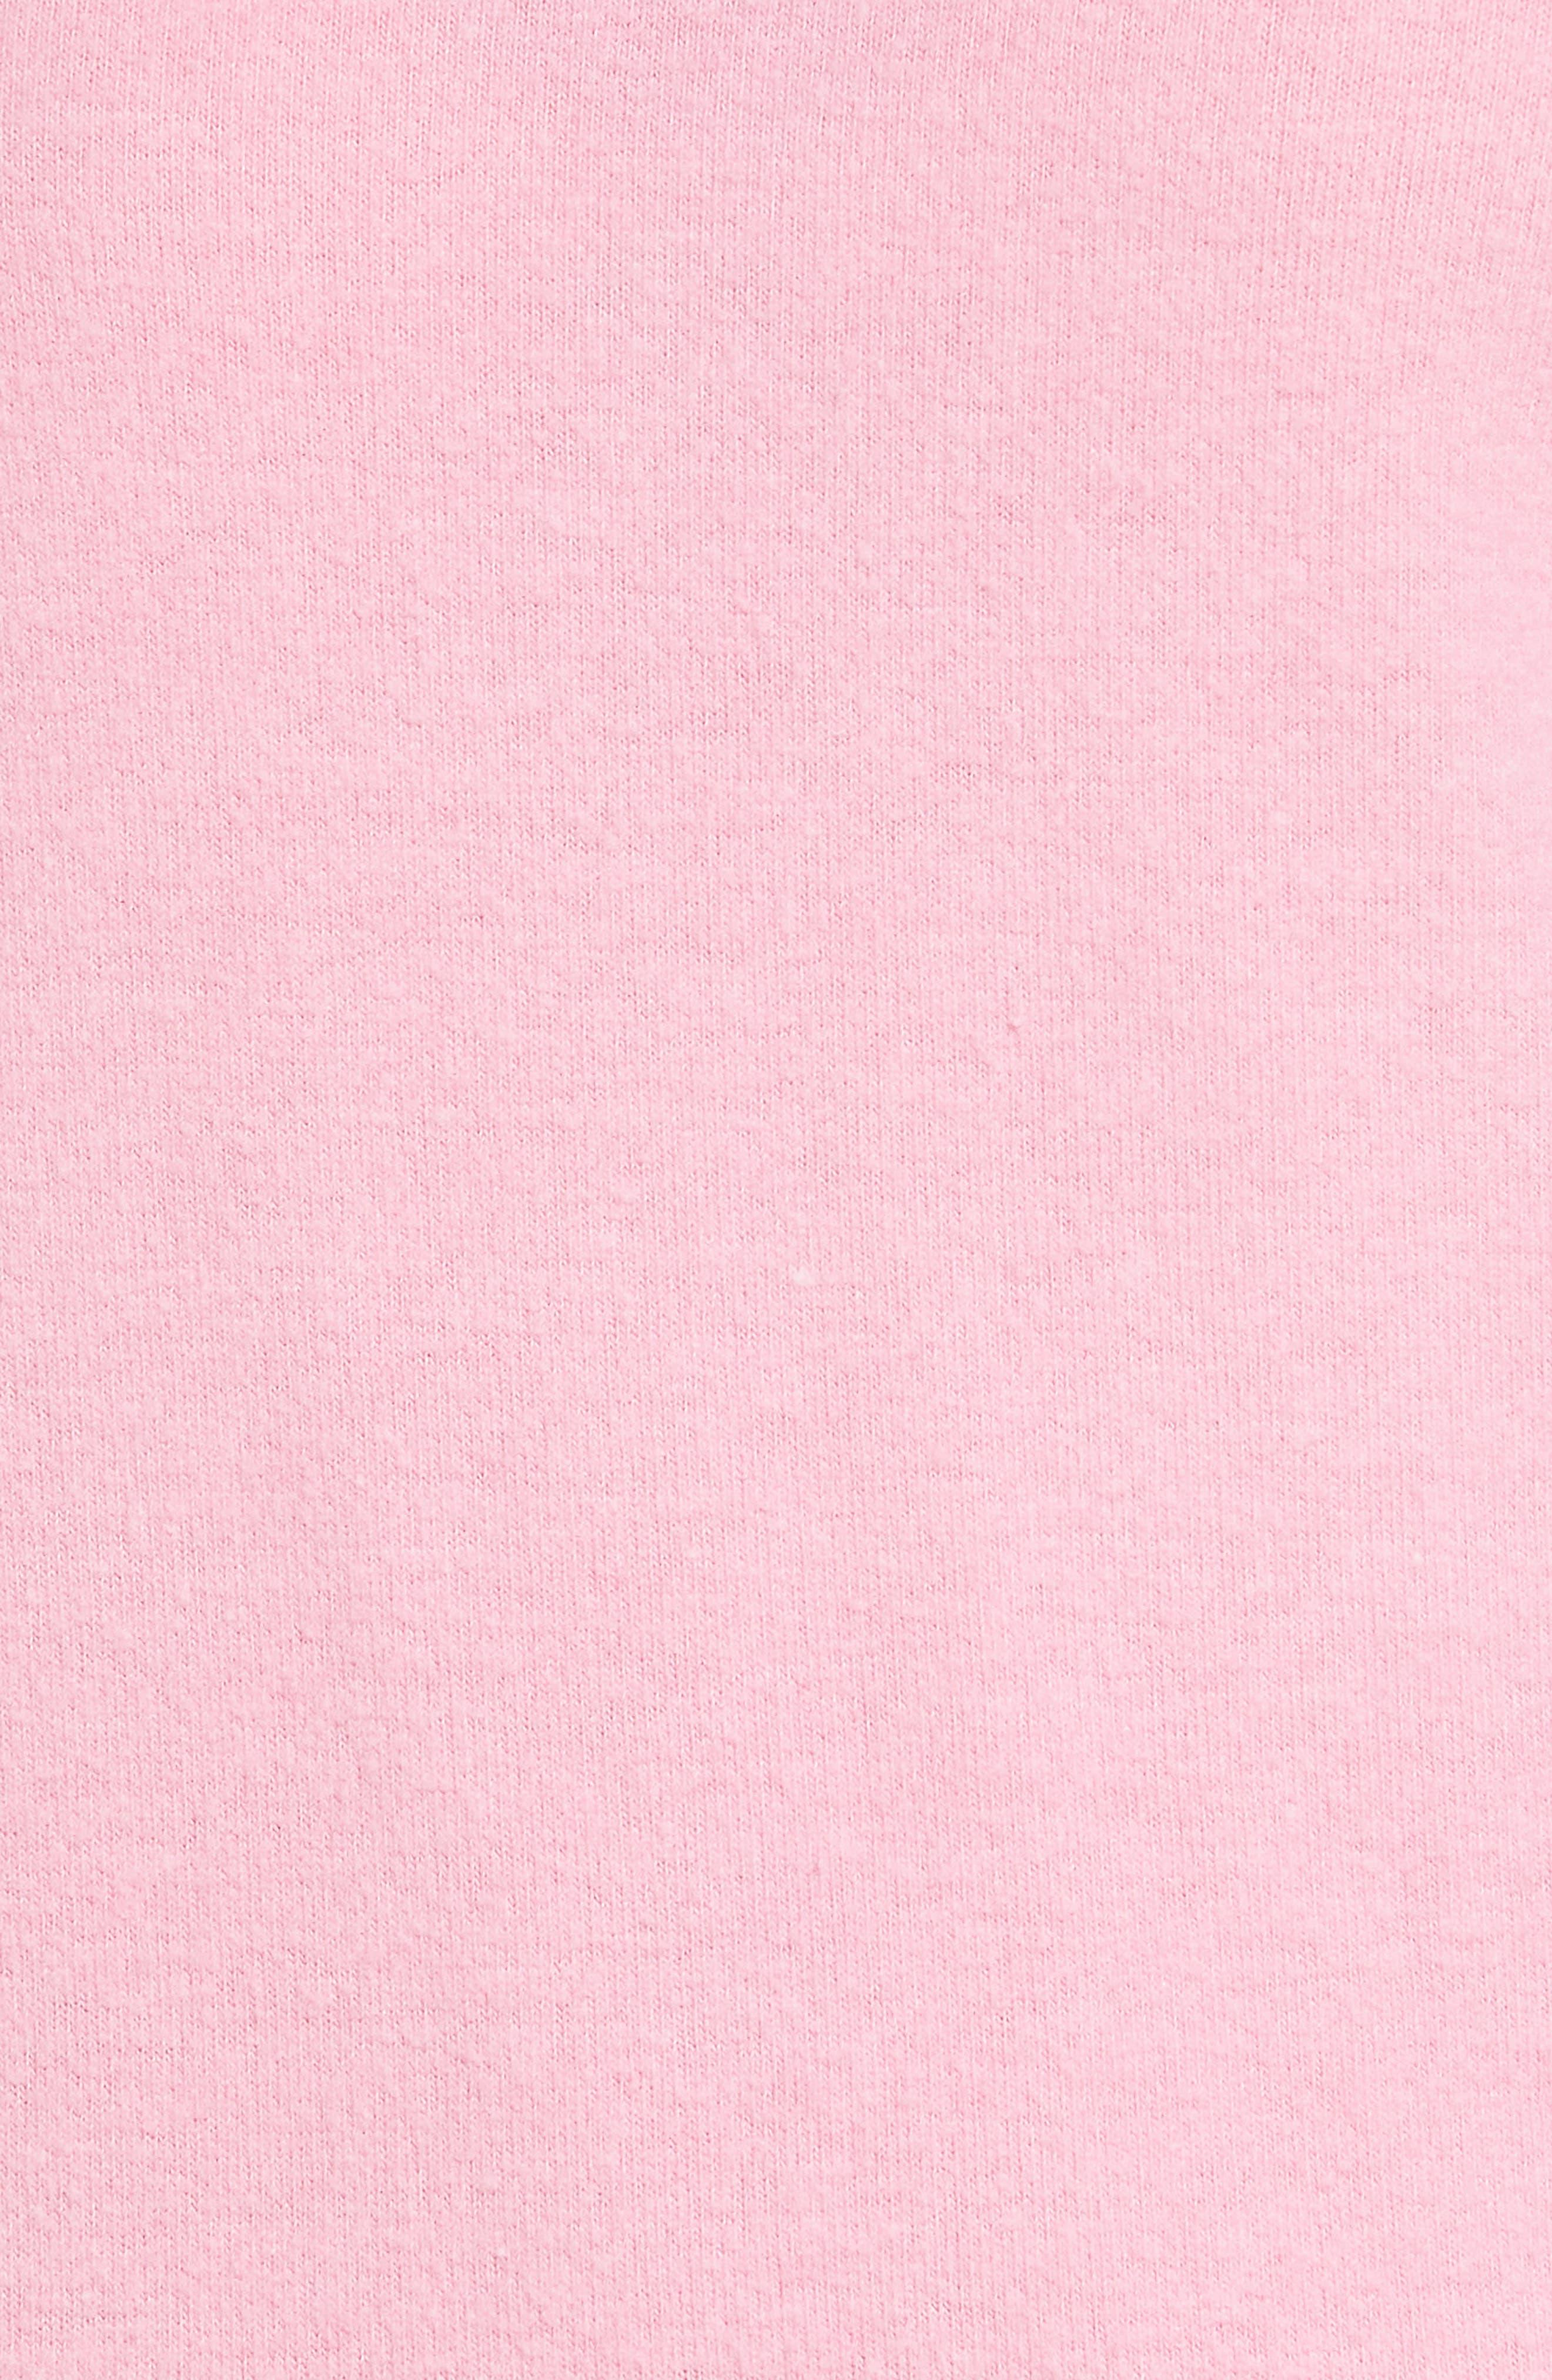 Friday Sweatshirt,                             Alternate thumbnail 5, color,                             Pink